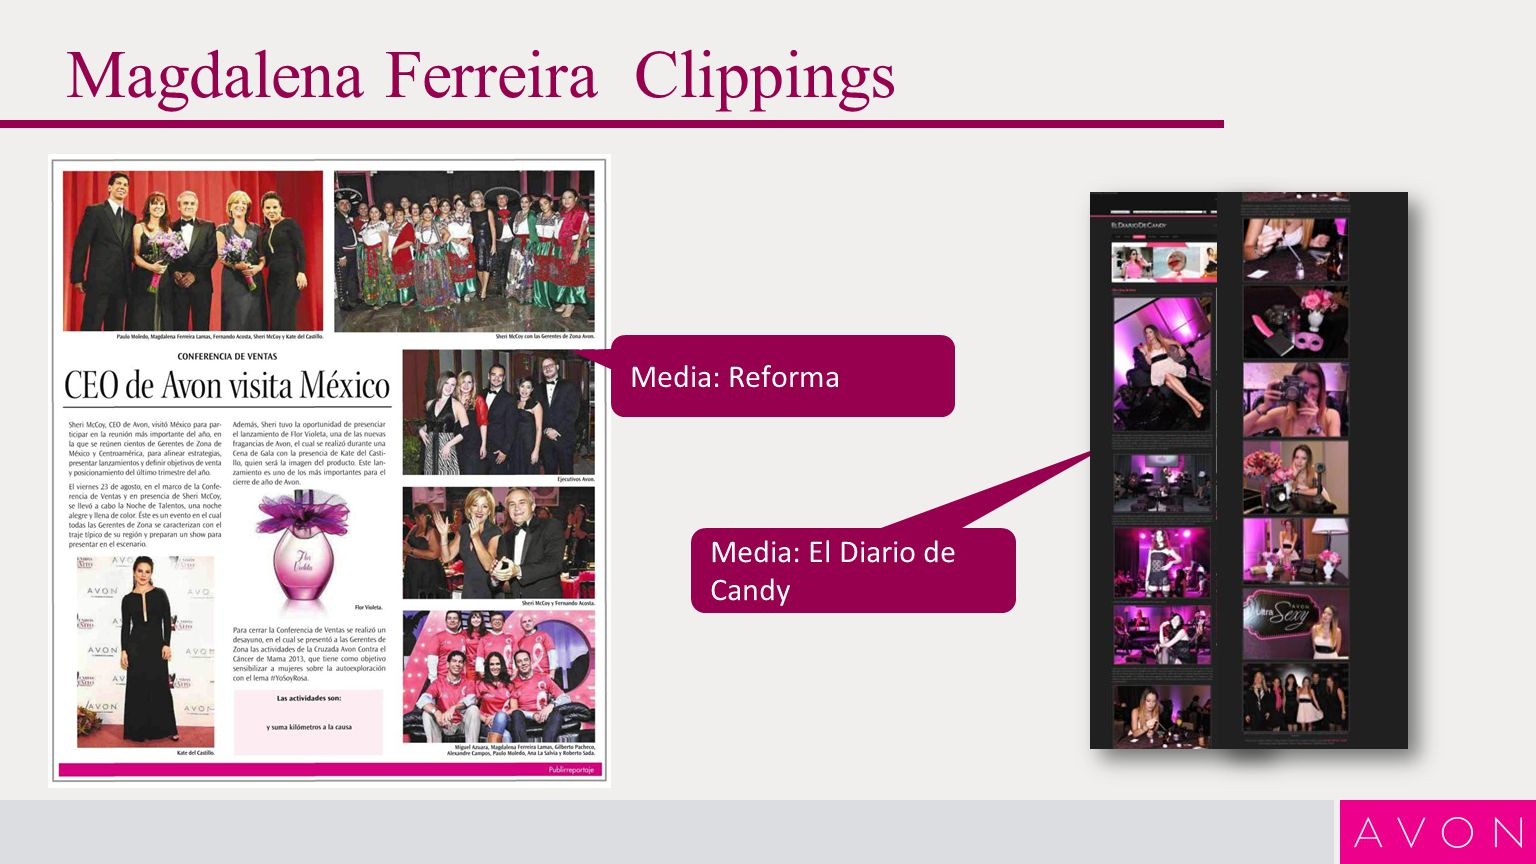 Magdalena Ferreira Clippings Media: Caras